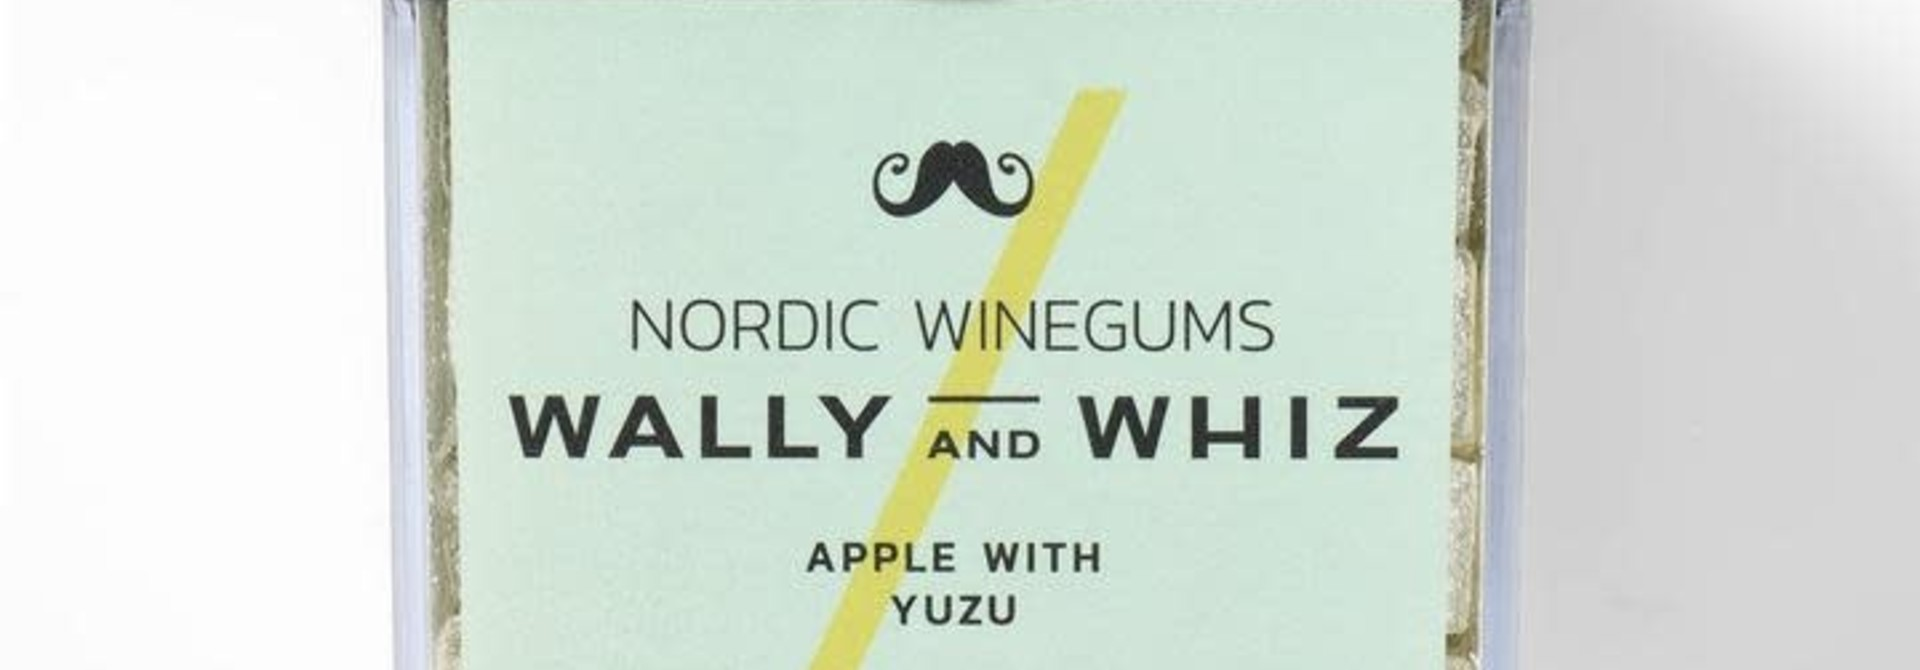 Apple with Yuzu